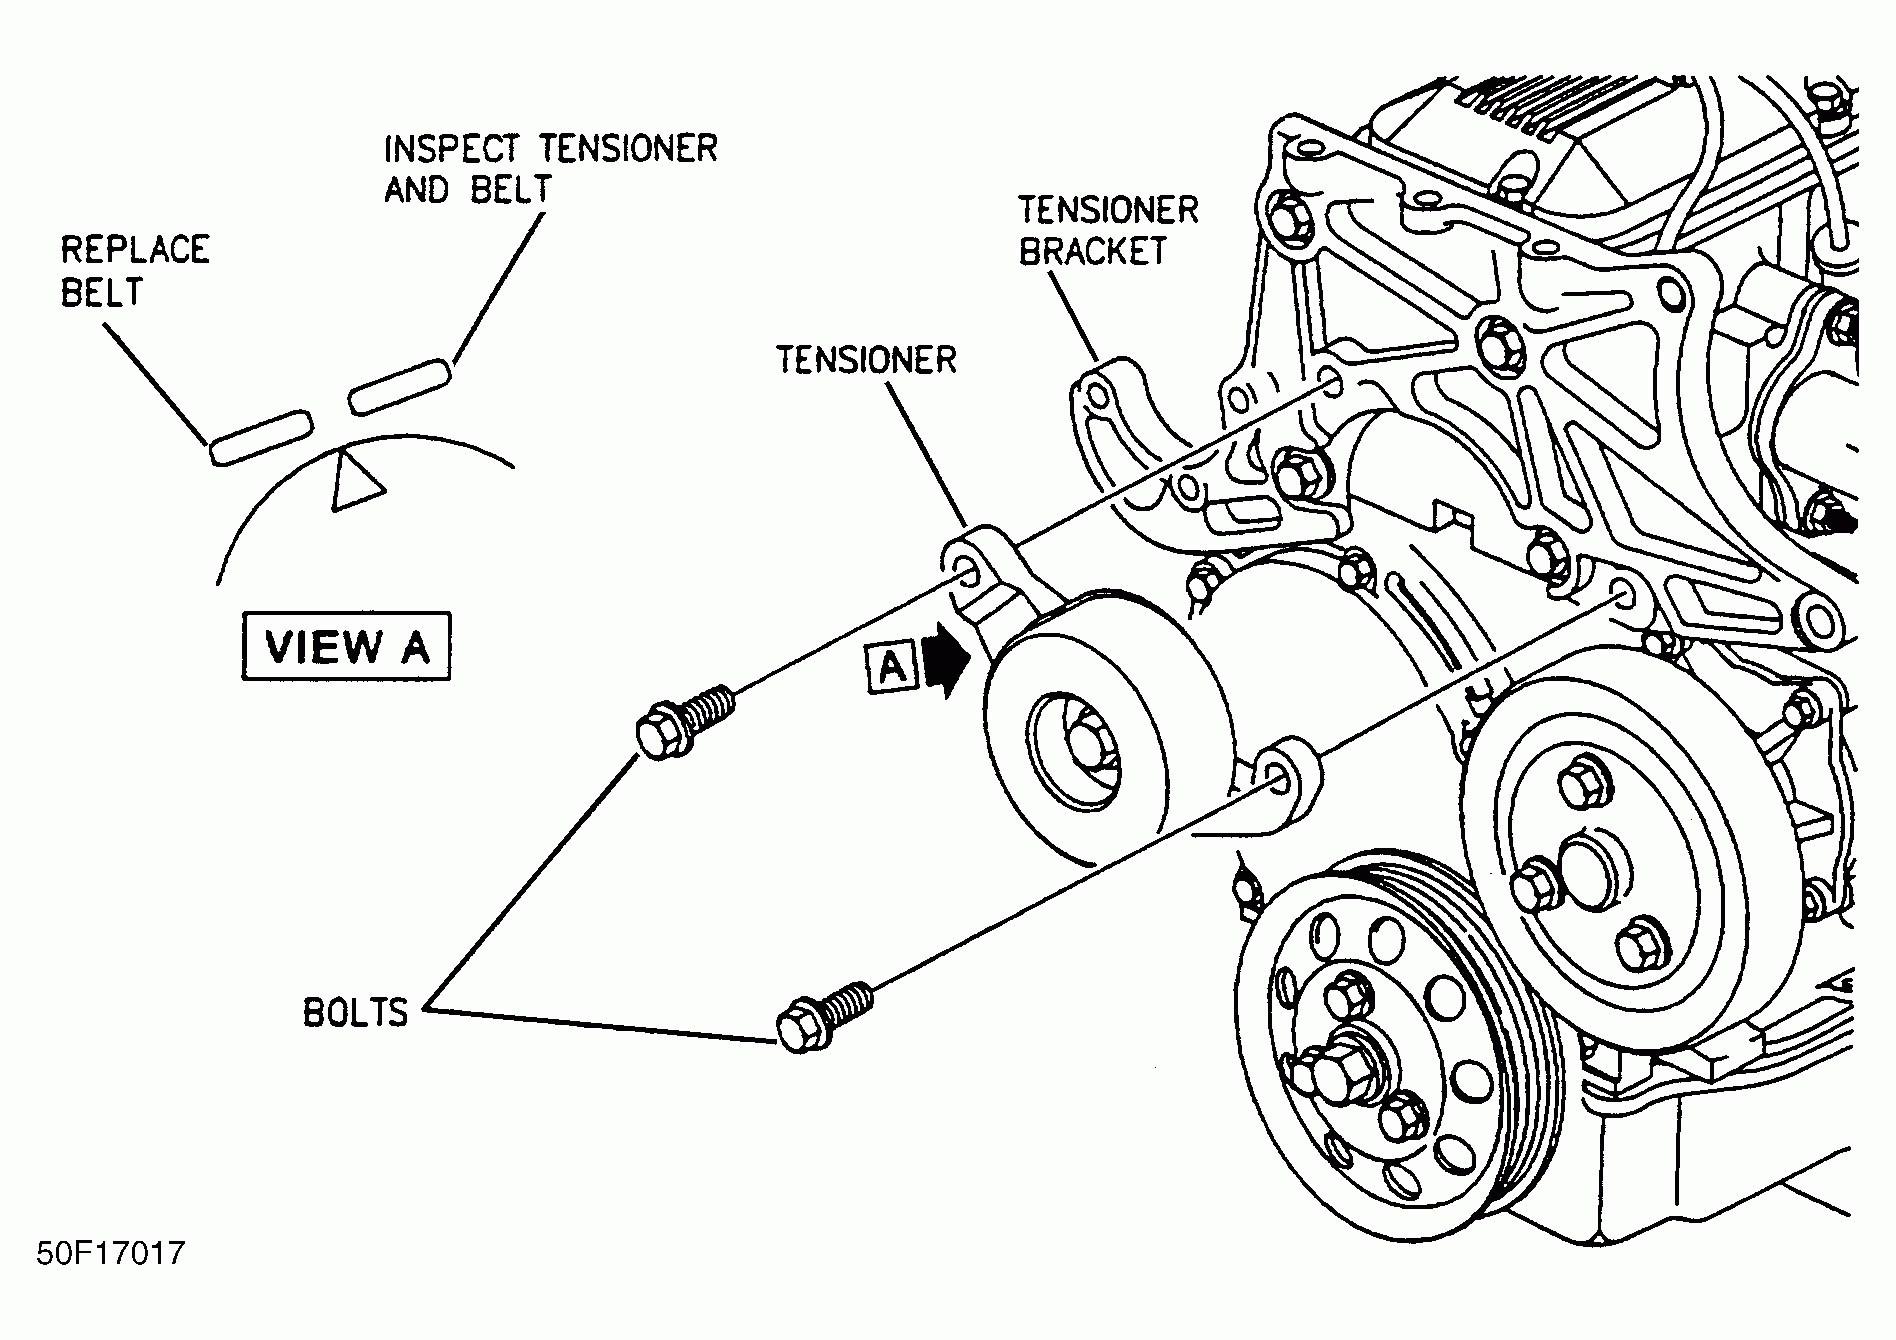 2001 Saturn Sl2 Engine Diagram 1997 Saturn Sc2 Engine Diagram Wiring Diagram Paper Of 2001 Saturn Sl2 Engine Diagram